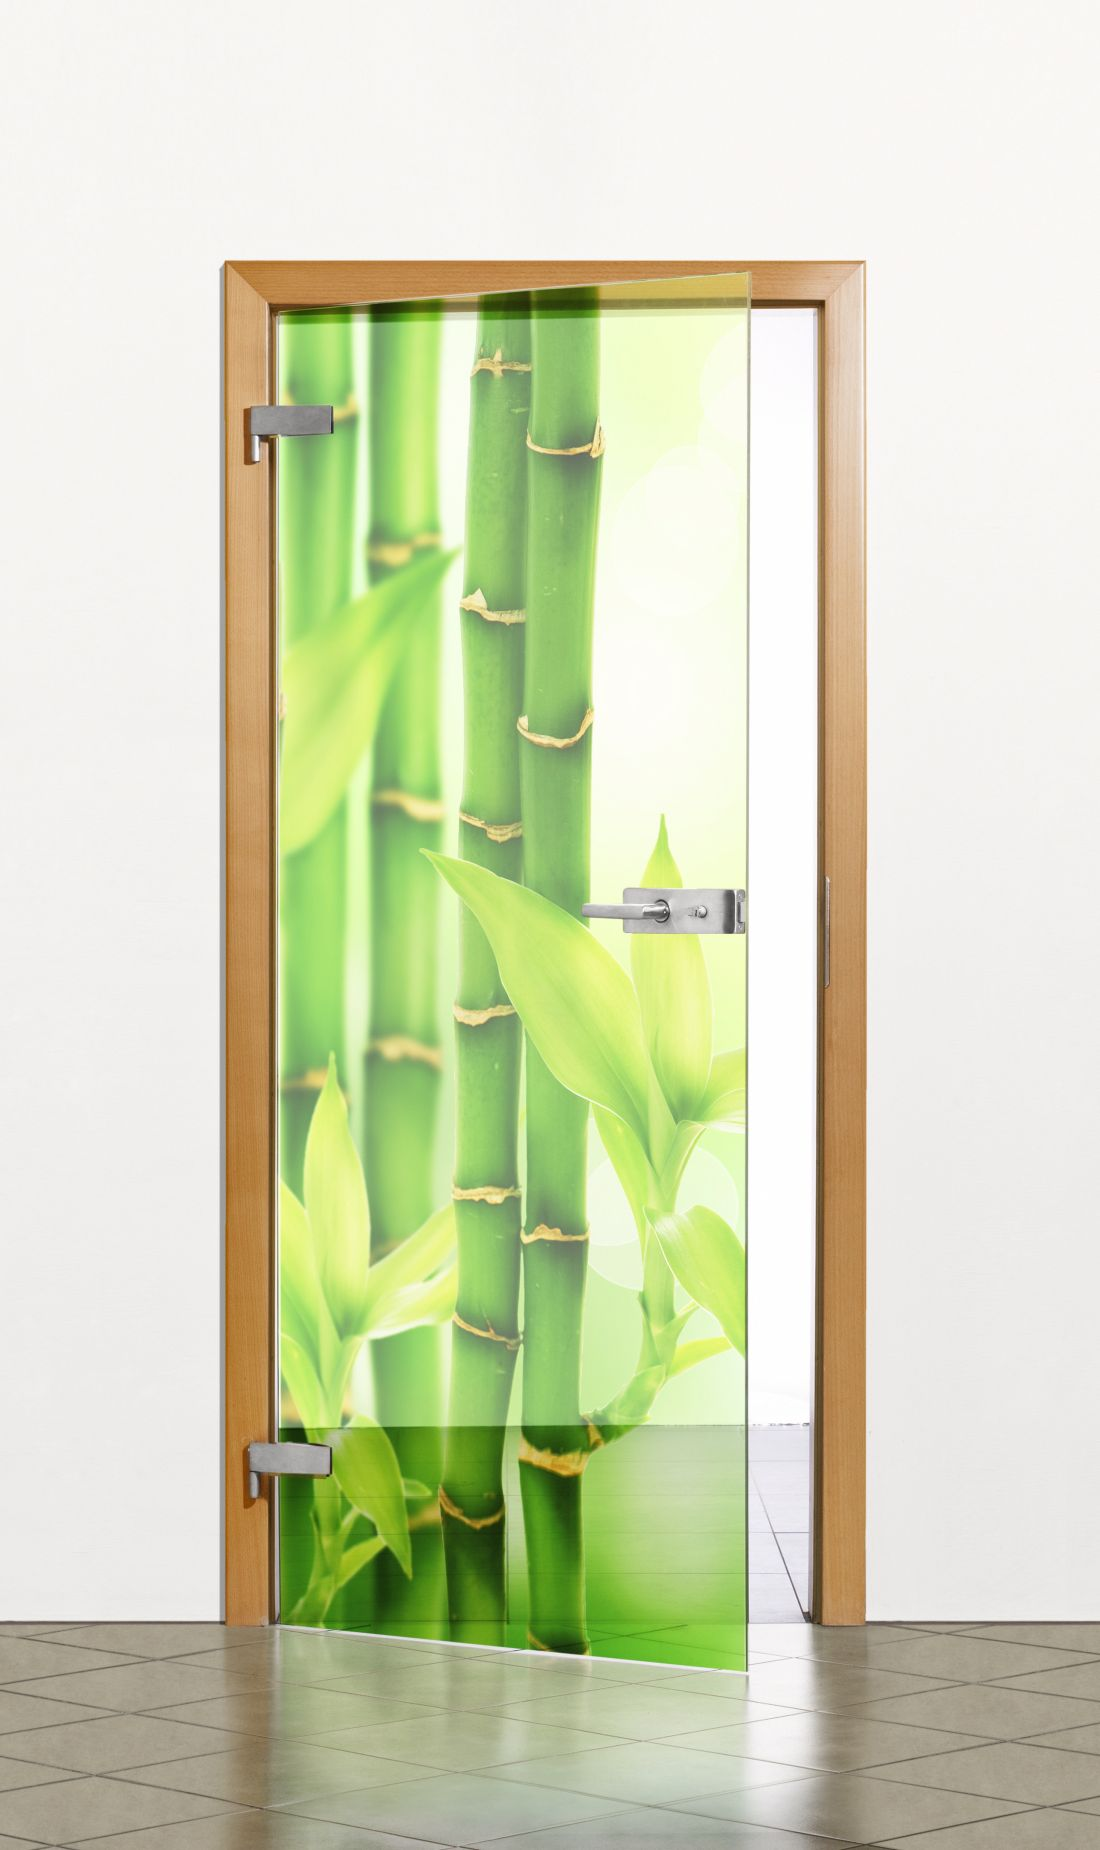 25grafosklo_dvere_bamboo_zdroj_jap_future.jpg